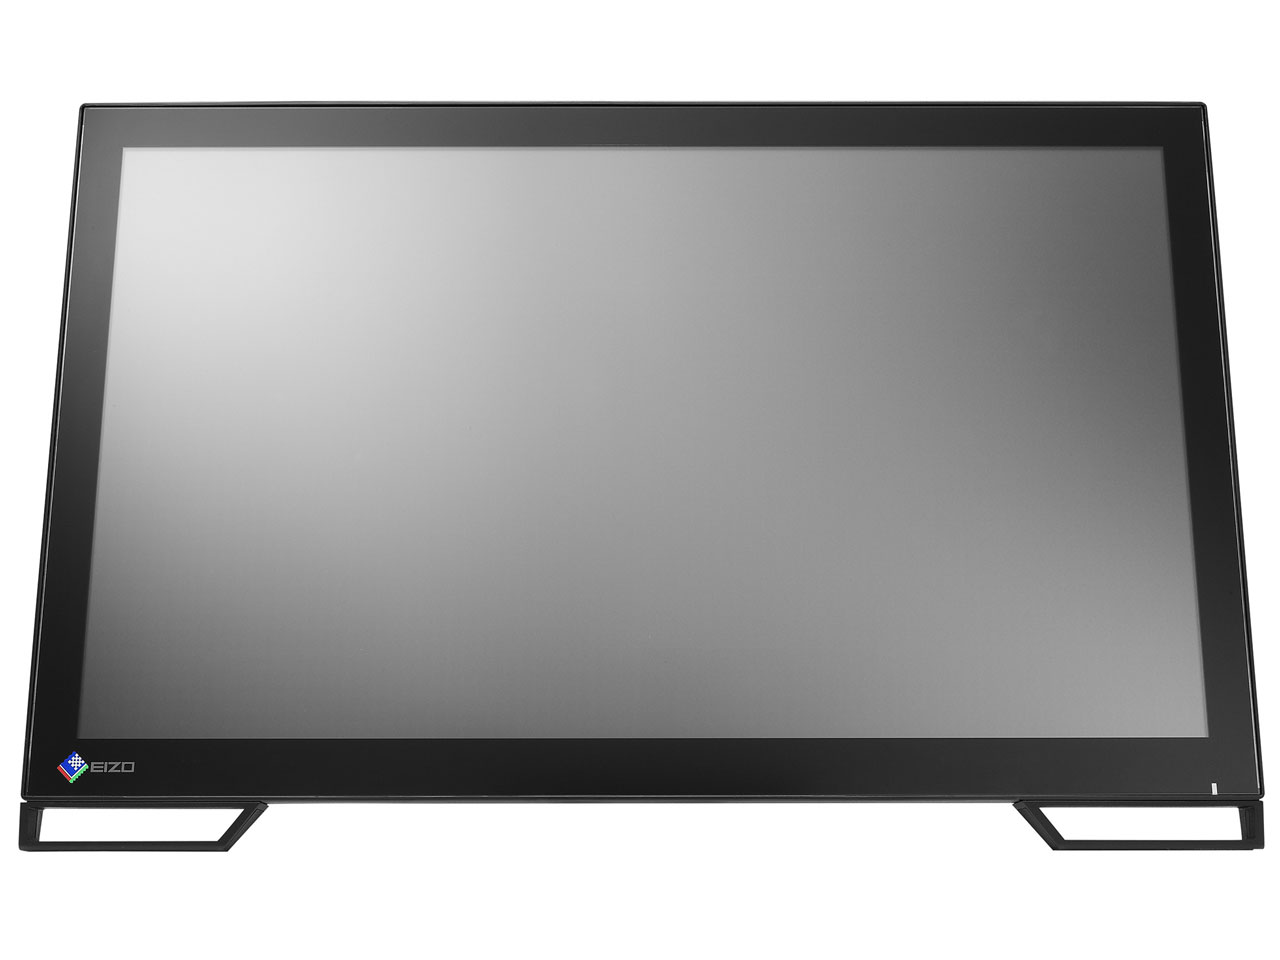 FlexScan T2381W T2381W-BK [23インチ ブラック] の製品画像